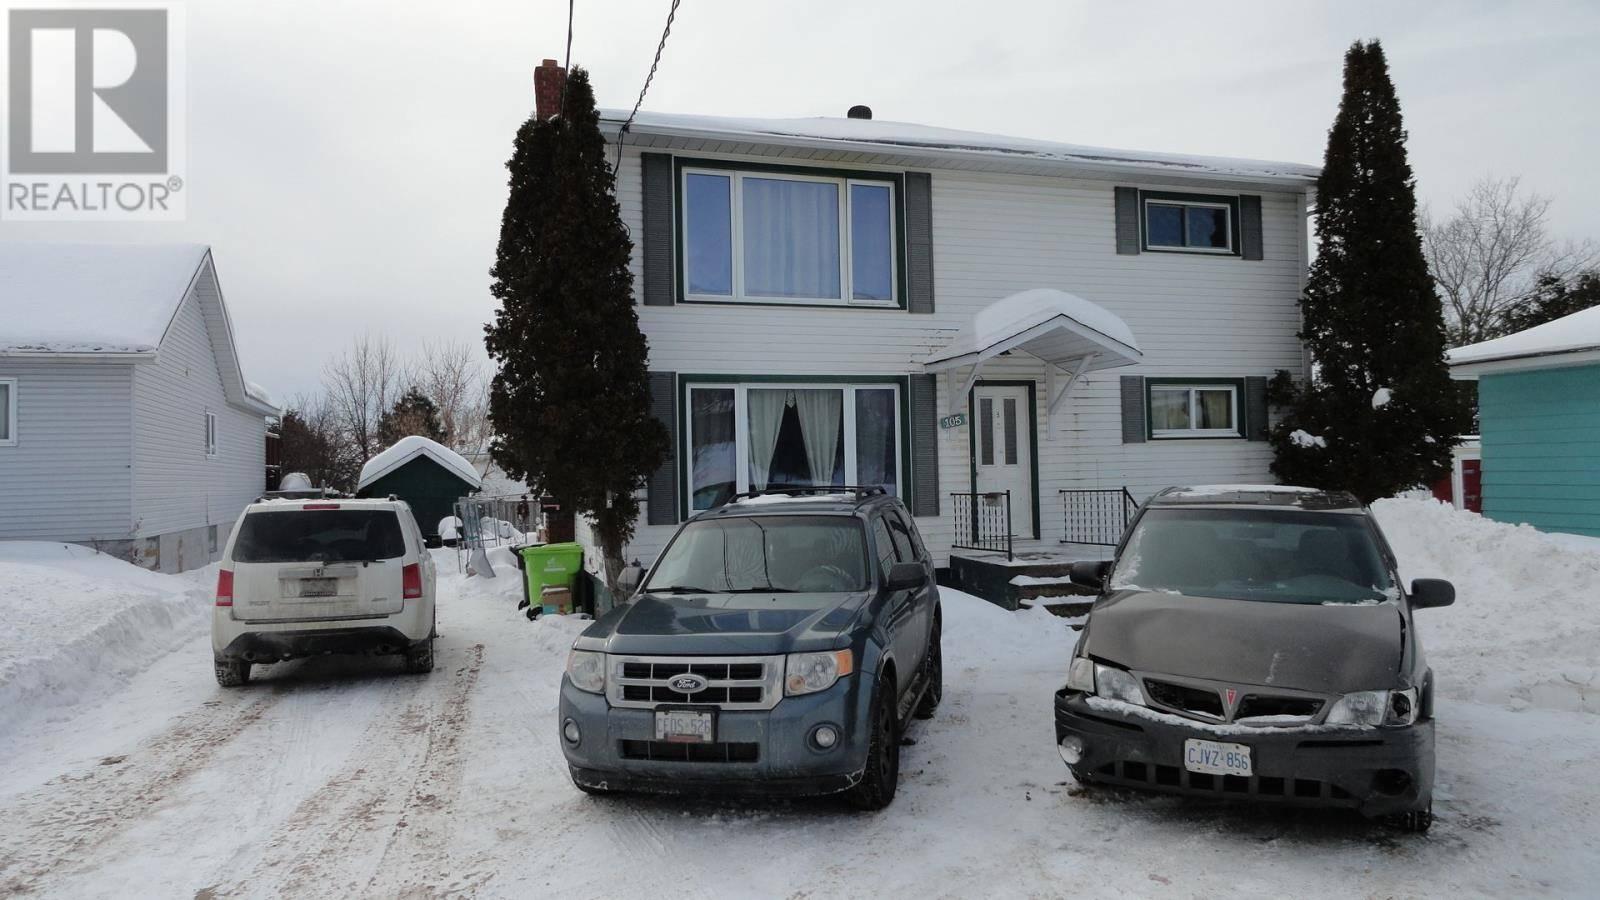 Townhouse for sale at 105 Elliott Rd Sault Ste. Marie Ontario - MLS: SM127779